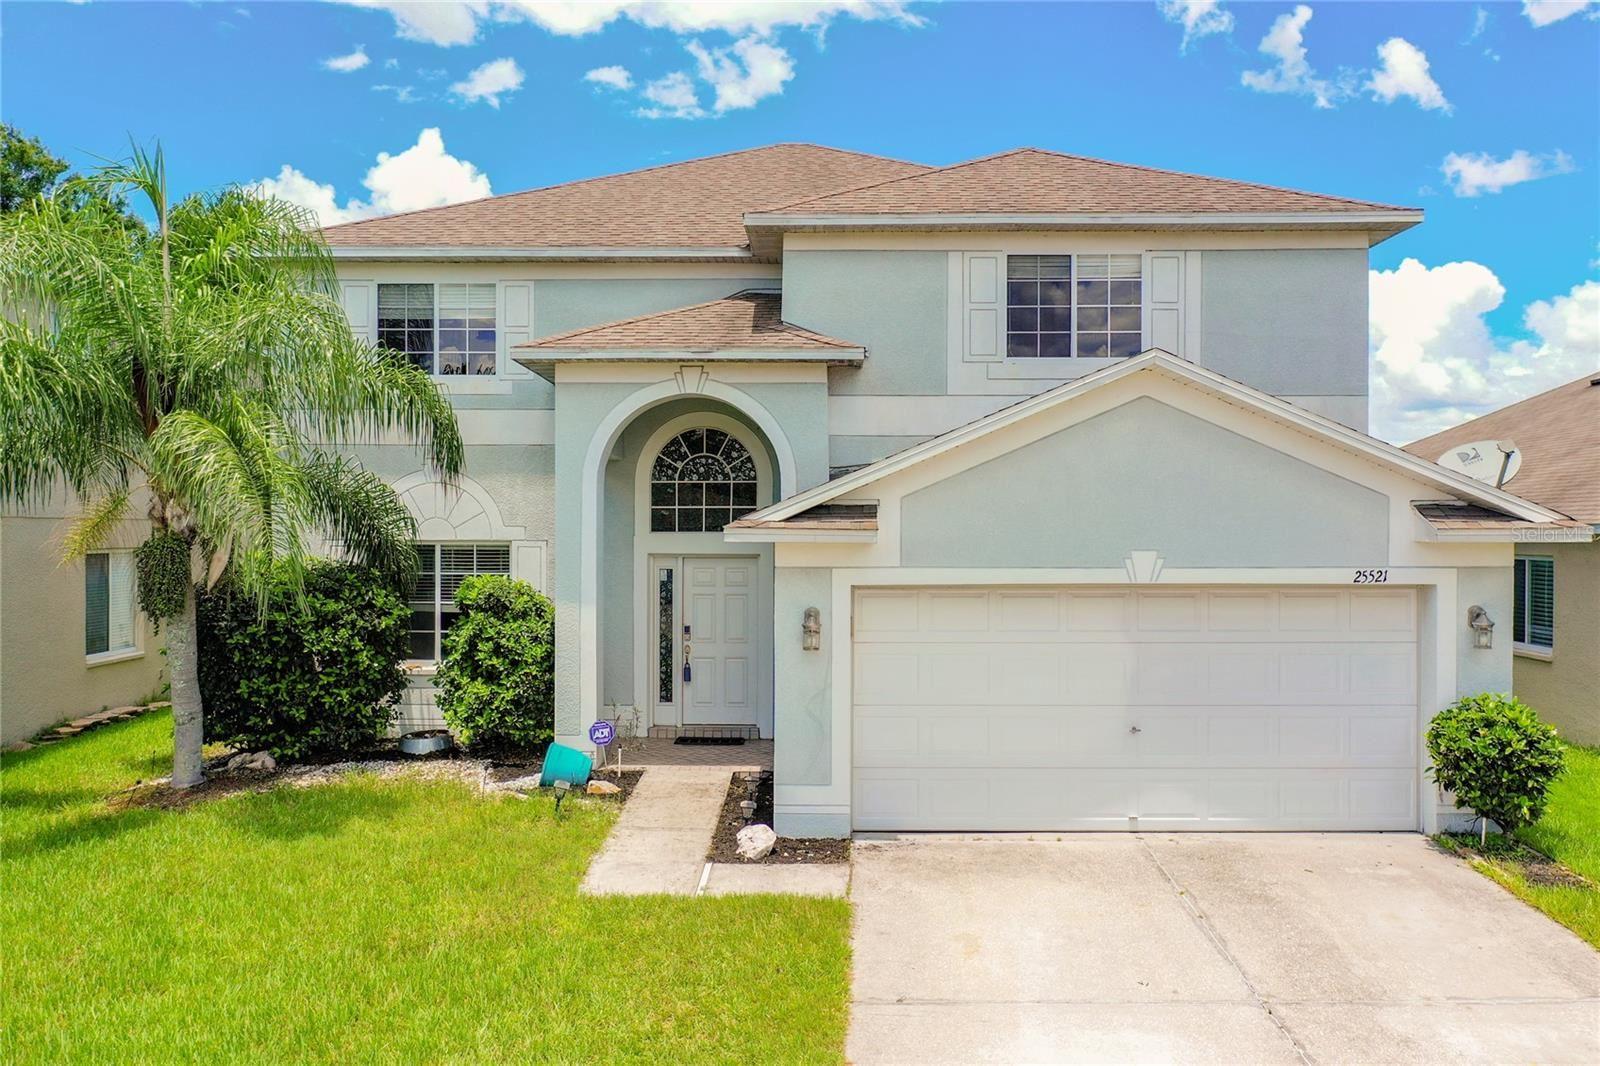 25521 BRUFORD BOULEVARD, Land O Lakes, FL 34639 - #: U8130804